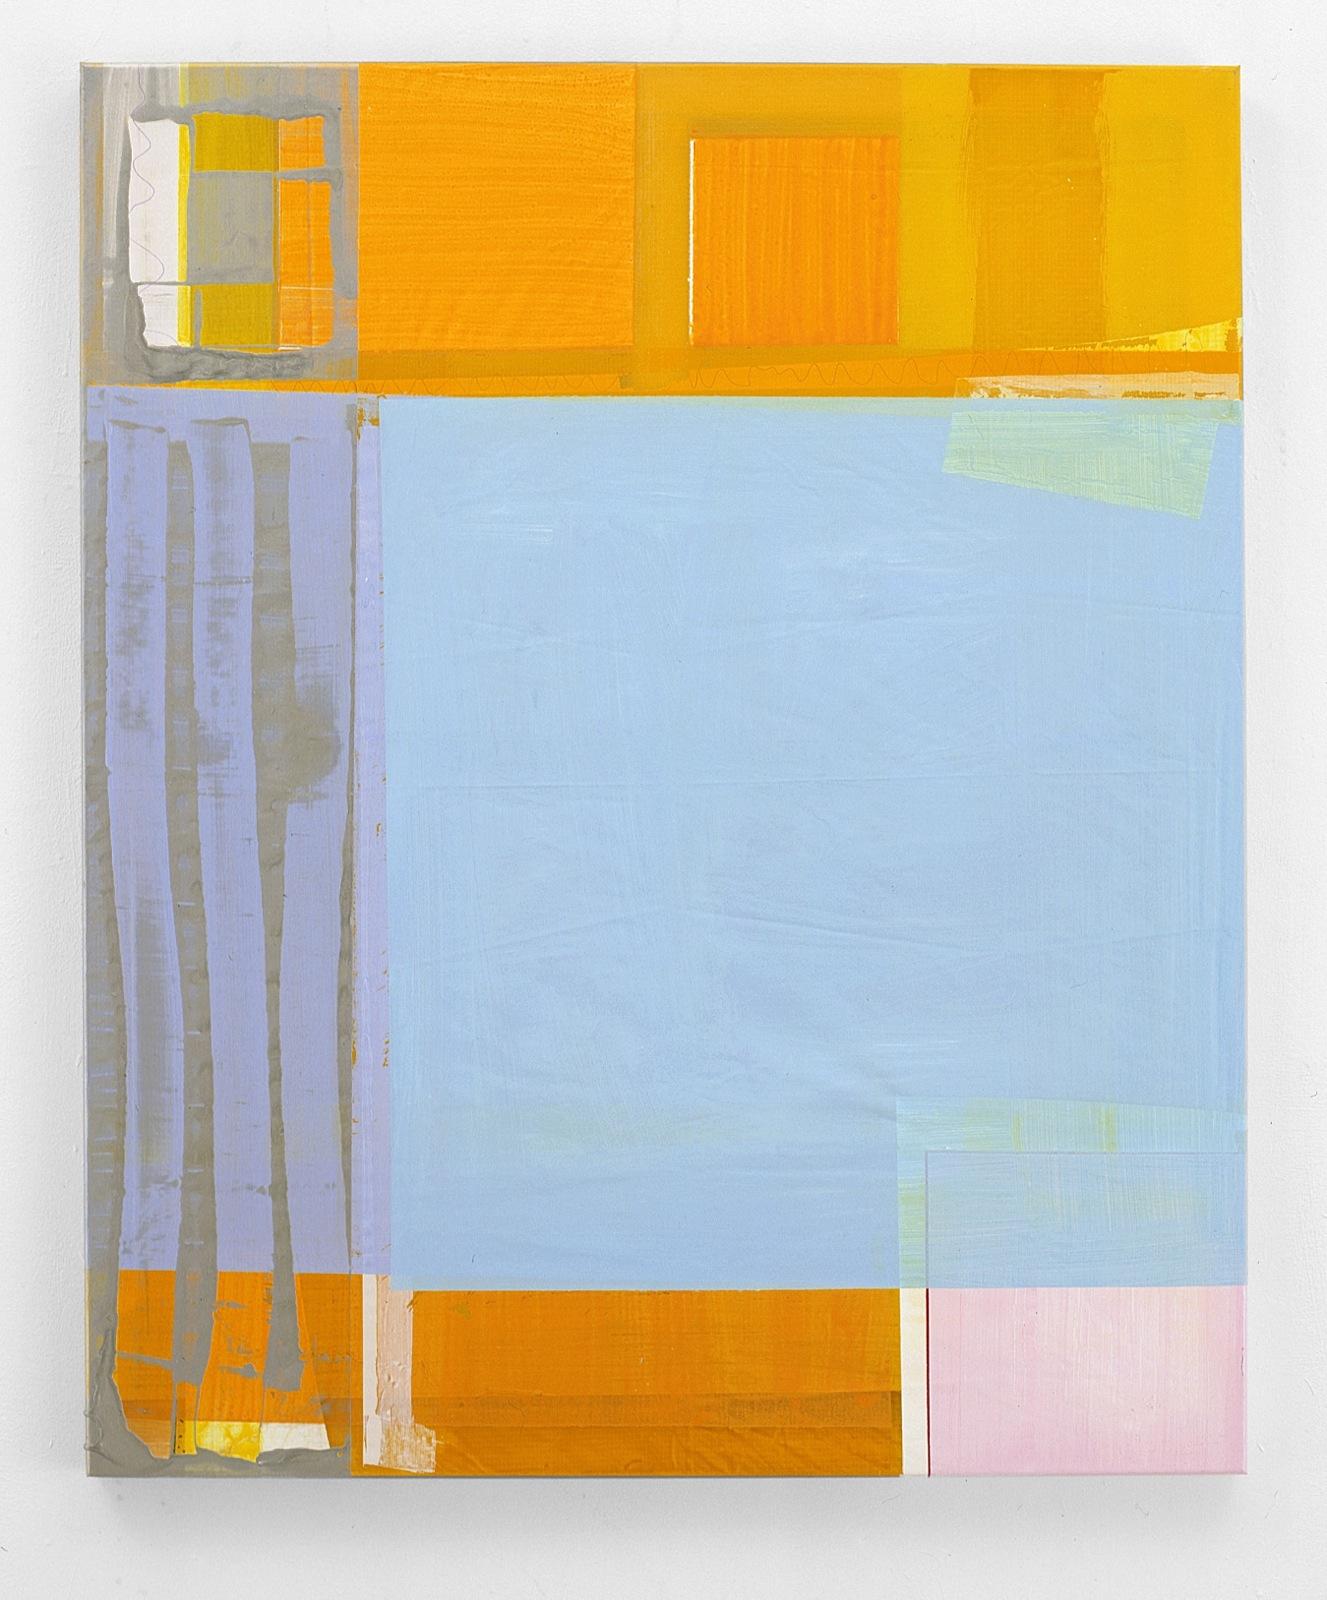 """Celeste"", 90x110 cm, Acrylfarbe, Zeltplane, 2001"